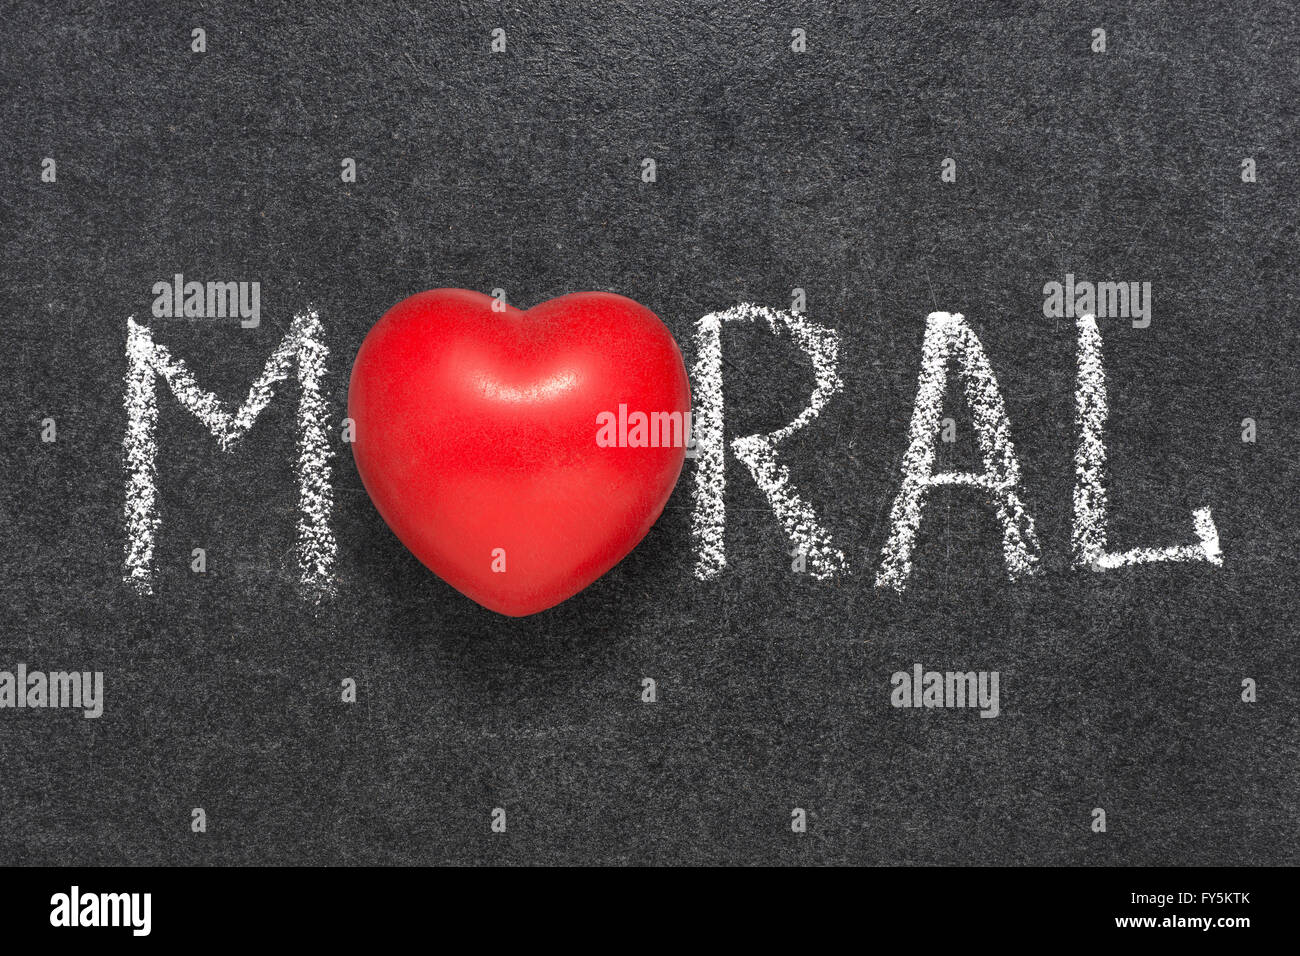 Moral word handwritten on blackboard with heart symbol instead o moral word handwritten on blackboard with heart symbol instead o biocorpaavc